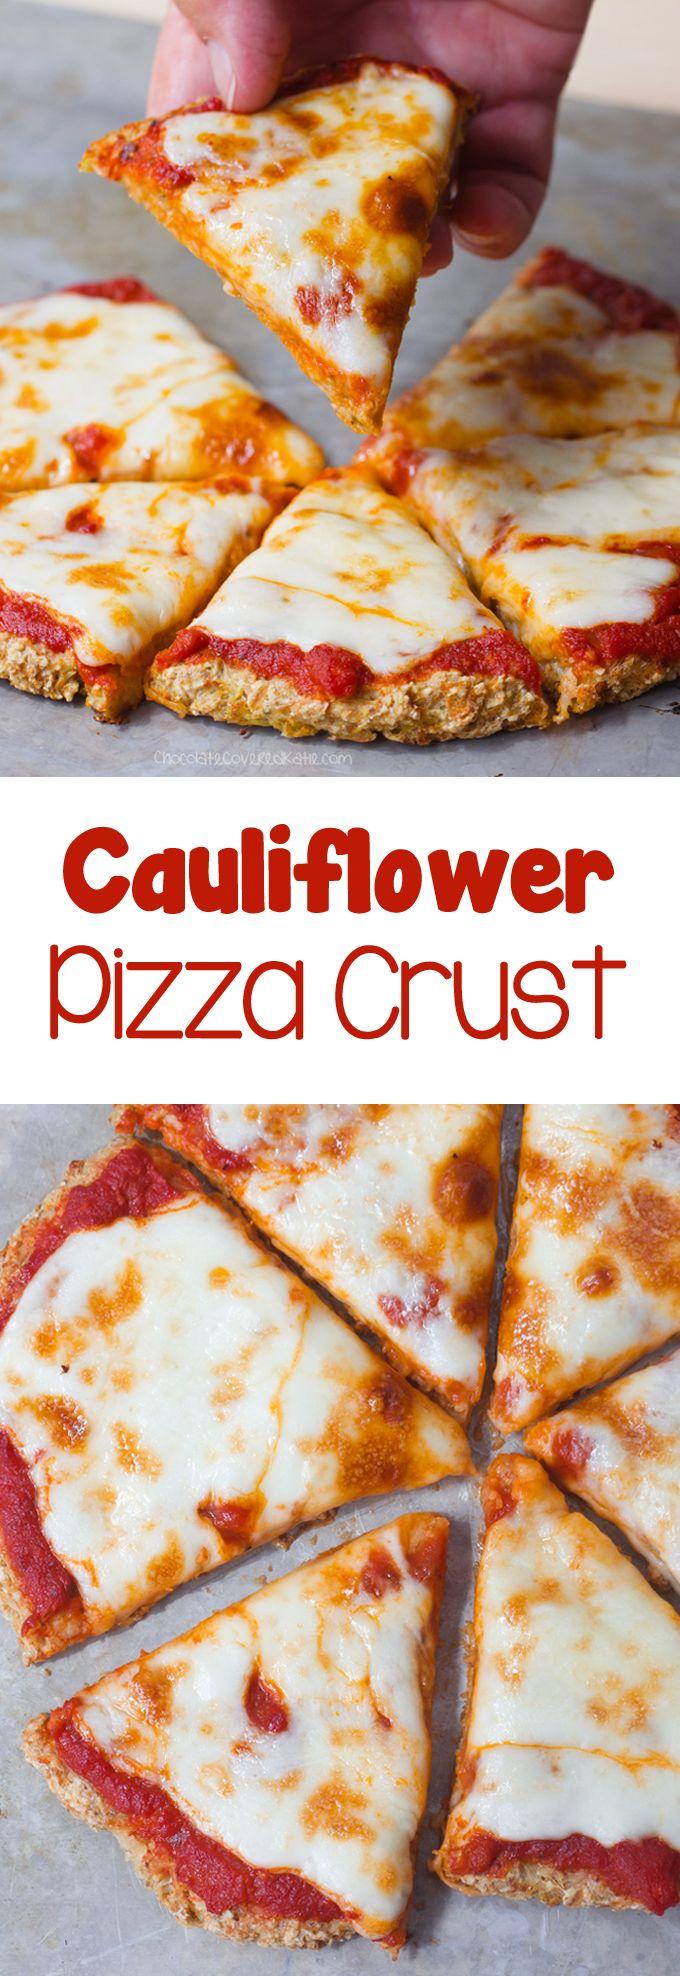 Coliflor Corteza de la pizza - Ingredientes: 1 coliflor, 1/4 taza de agua, 1 cucharadita de orégano, 2 cucharadas de ... receta completa: @choccoveredkt chocolatecoveredkatie.com/2016/09/05/cauliflower-pizza-crust-vegan/